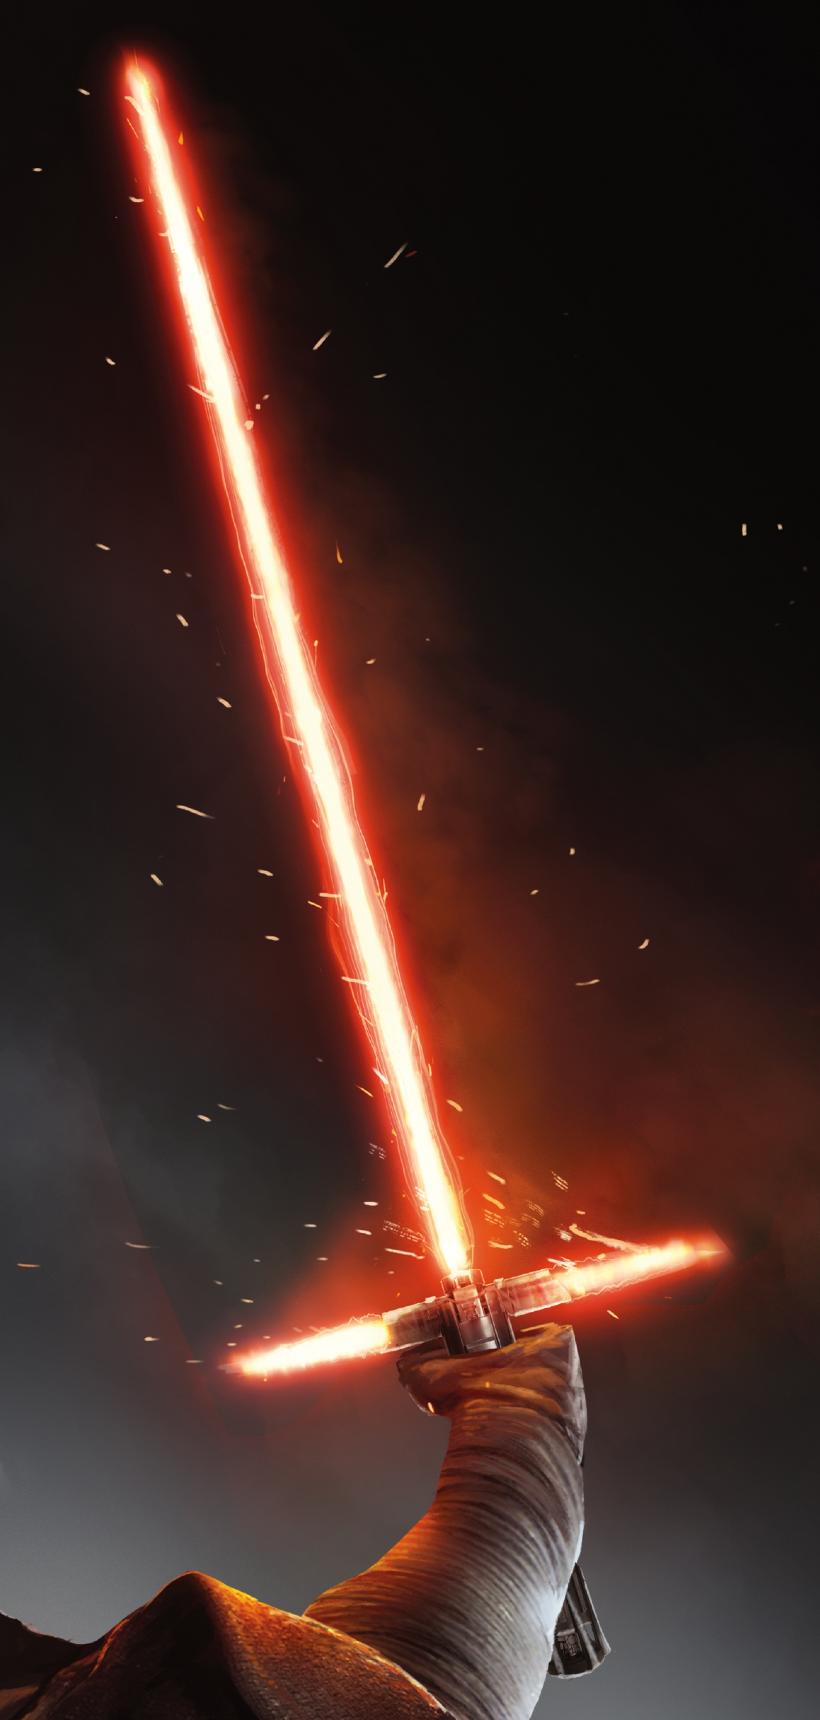 Kylo Ren S Lightsaber Star Wars Geek Star Wars Art Lightsaber Colors